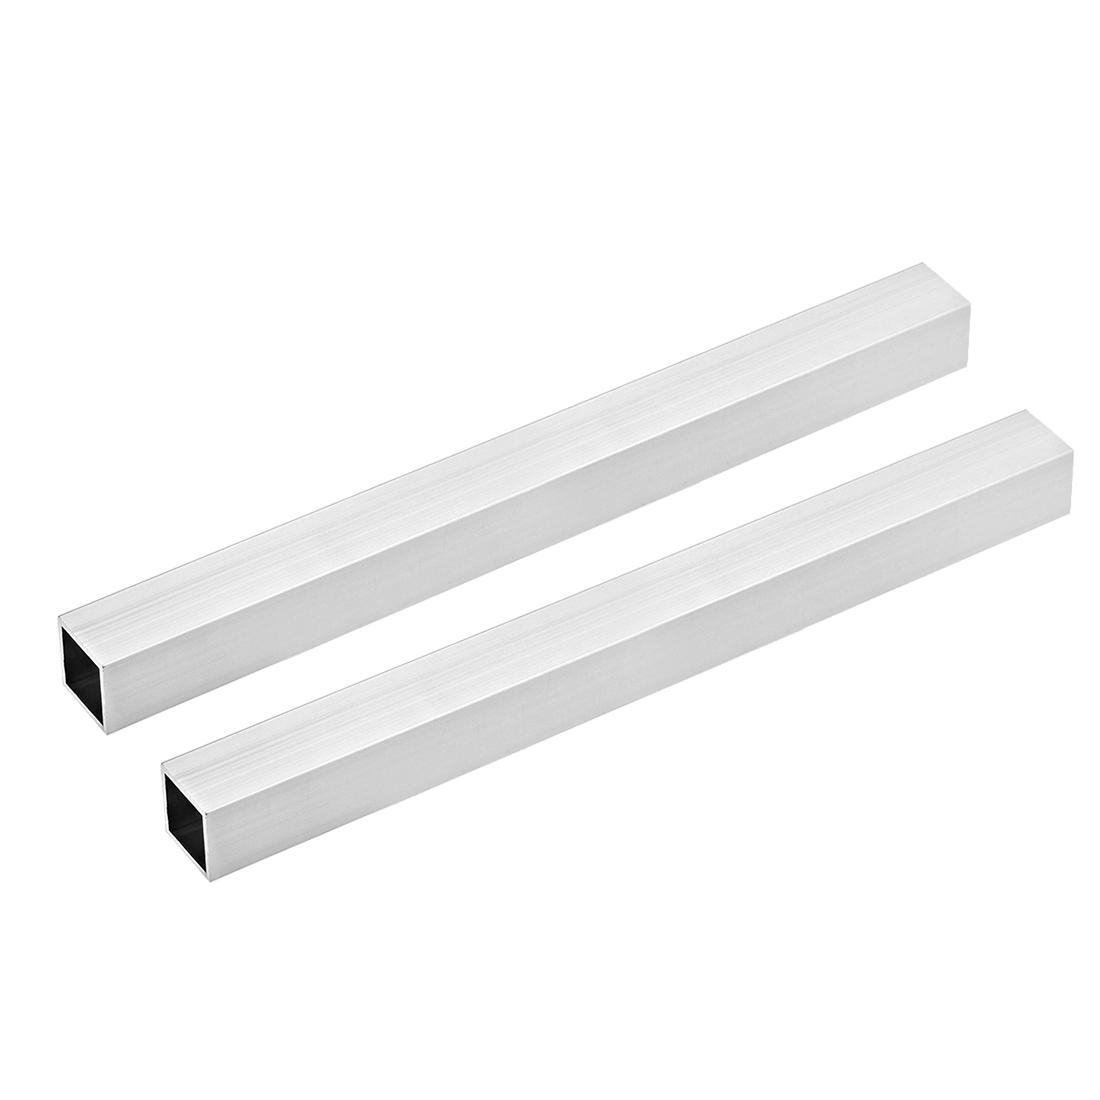 6063 Aluminum Square Tube 25mmx25mmx1.5mm Wall Thickness 300mm Long Tubing 2 Pcs